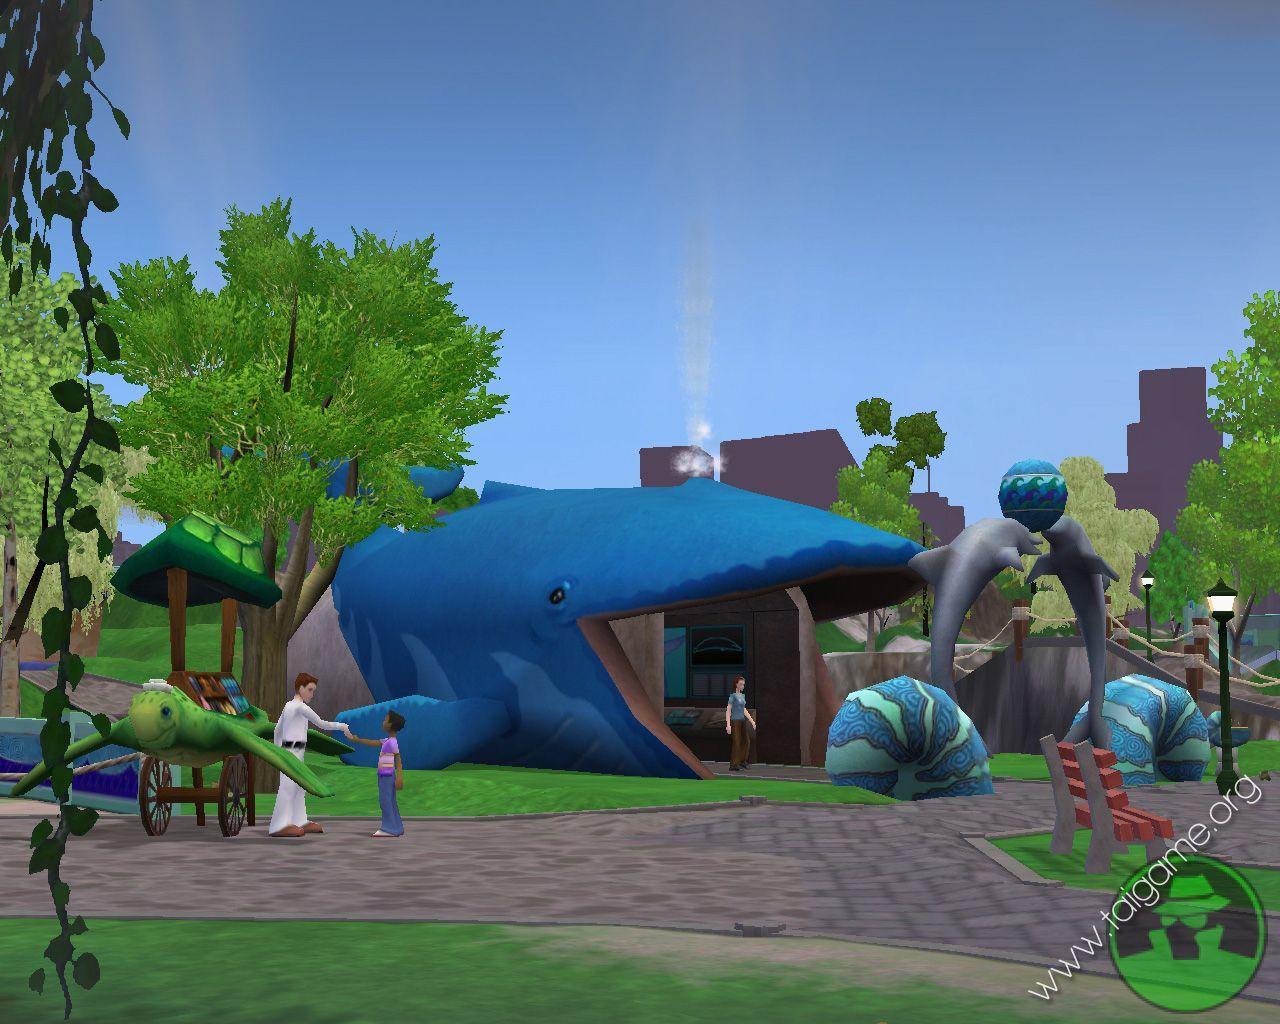 Zoo Tycoon 2: Marine Mania Demo free download - bestofile